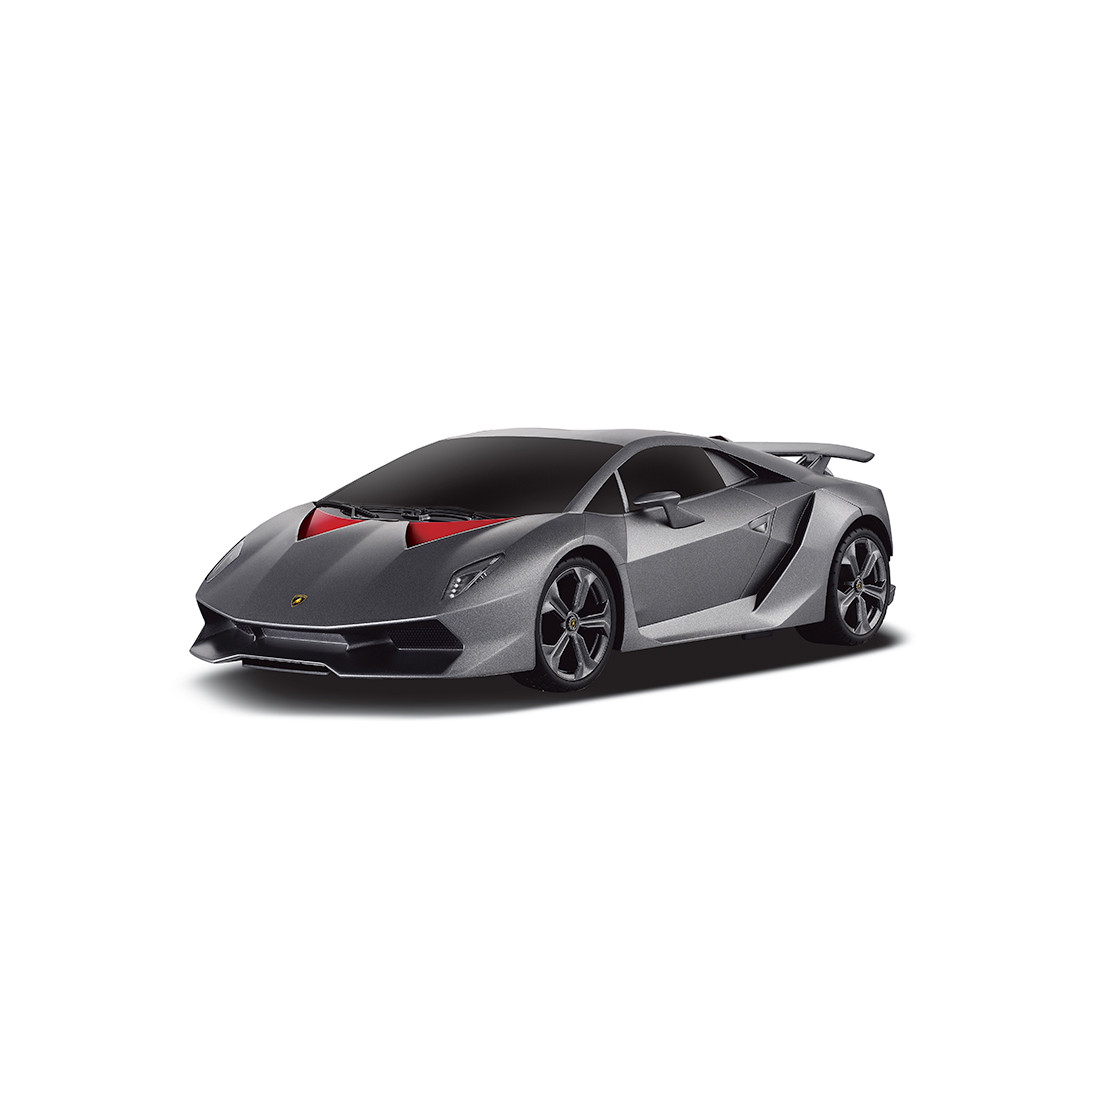 Машина RASTAR радиоуправляемая Lamborghini Sesto  Elemento 53700-10G (Радиоуправляемая машина, RASTAR,